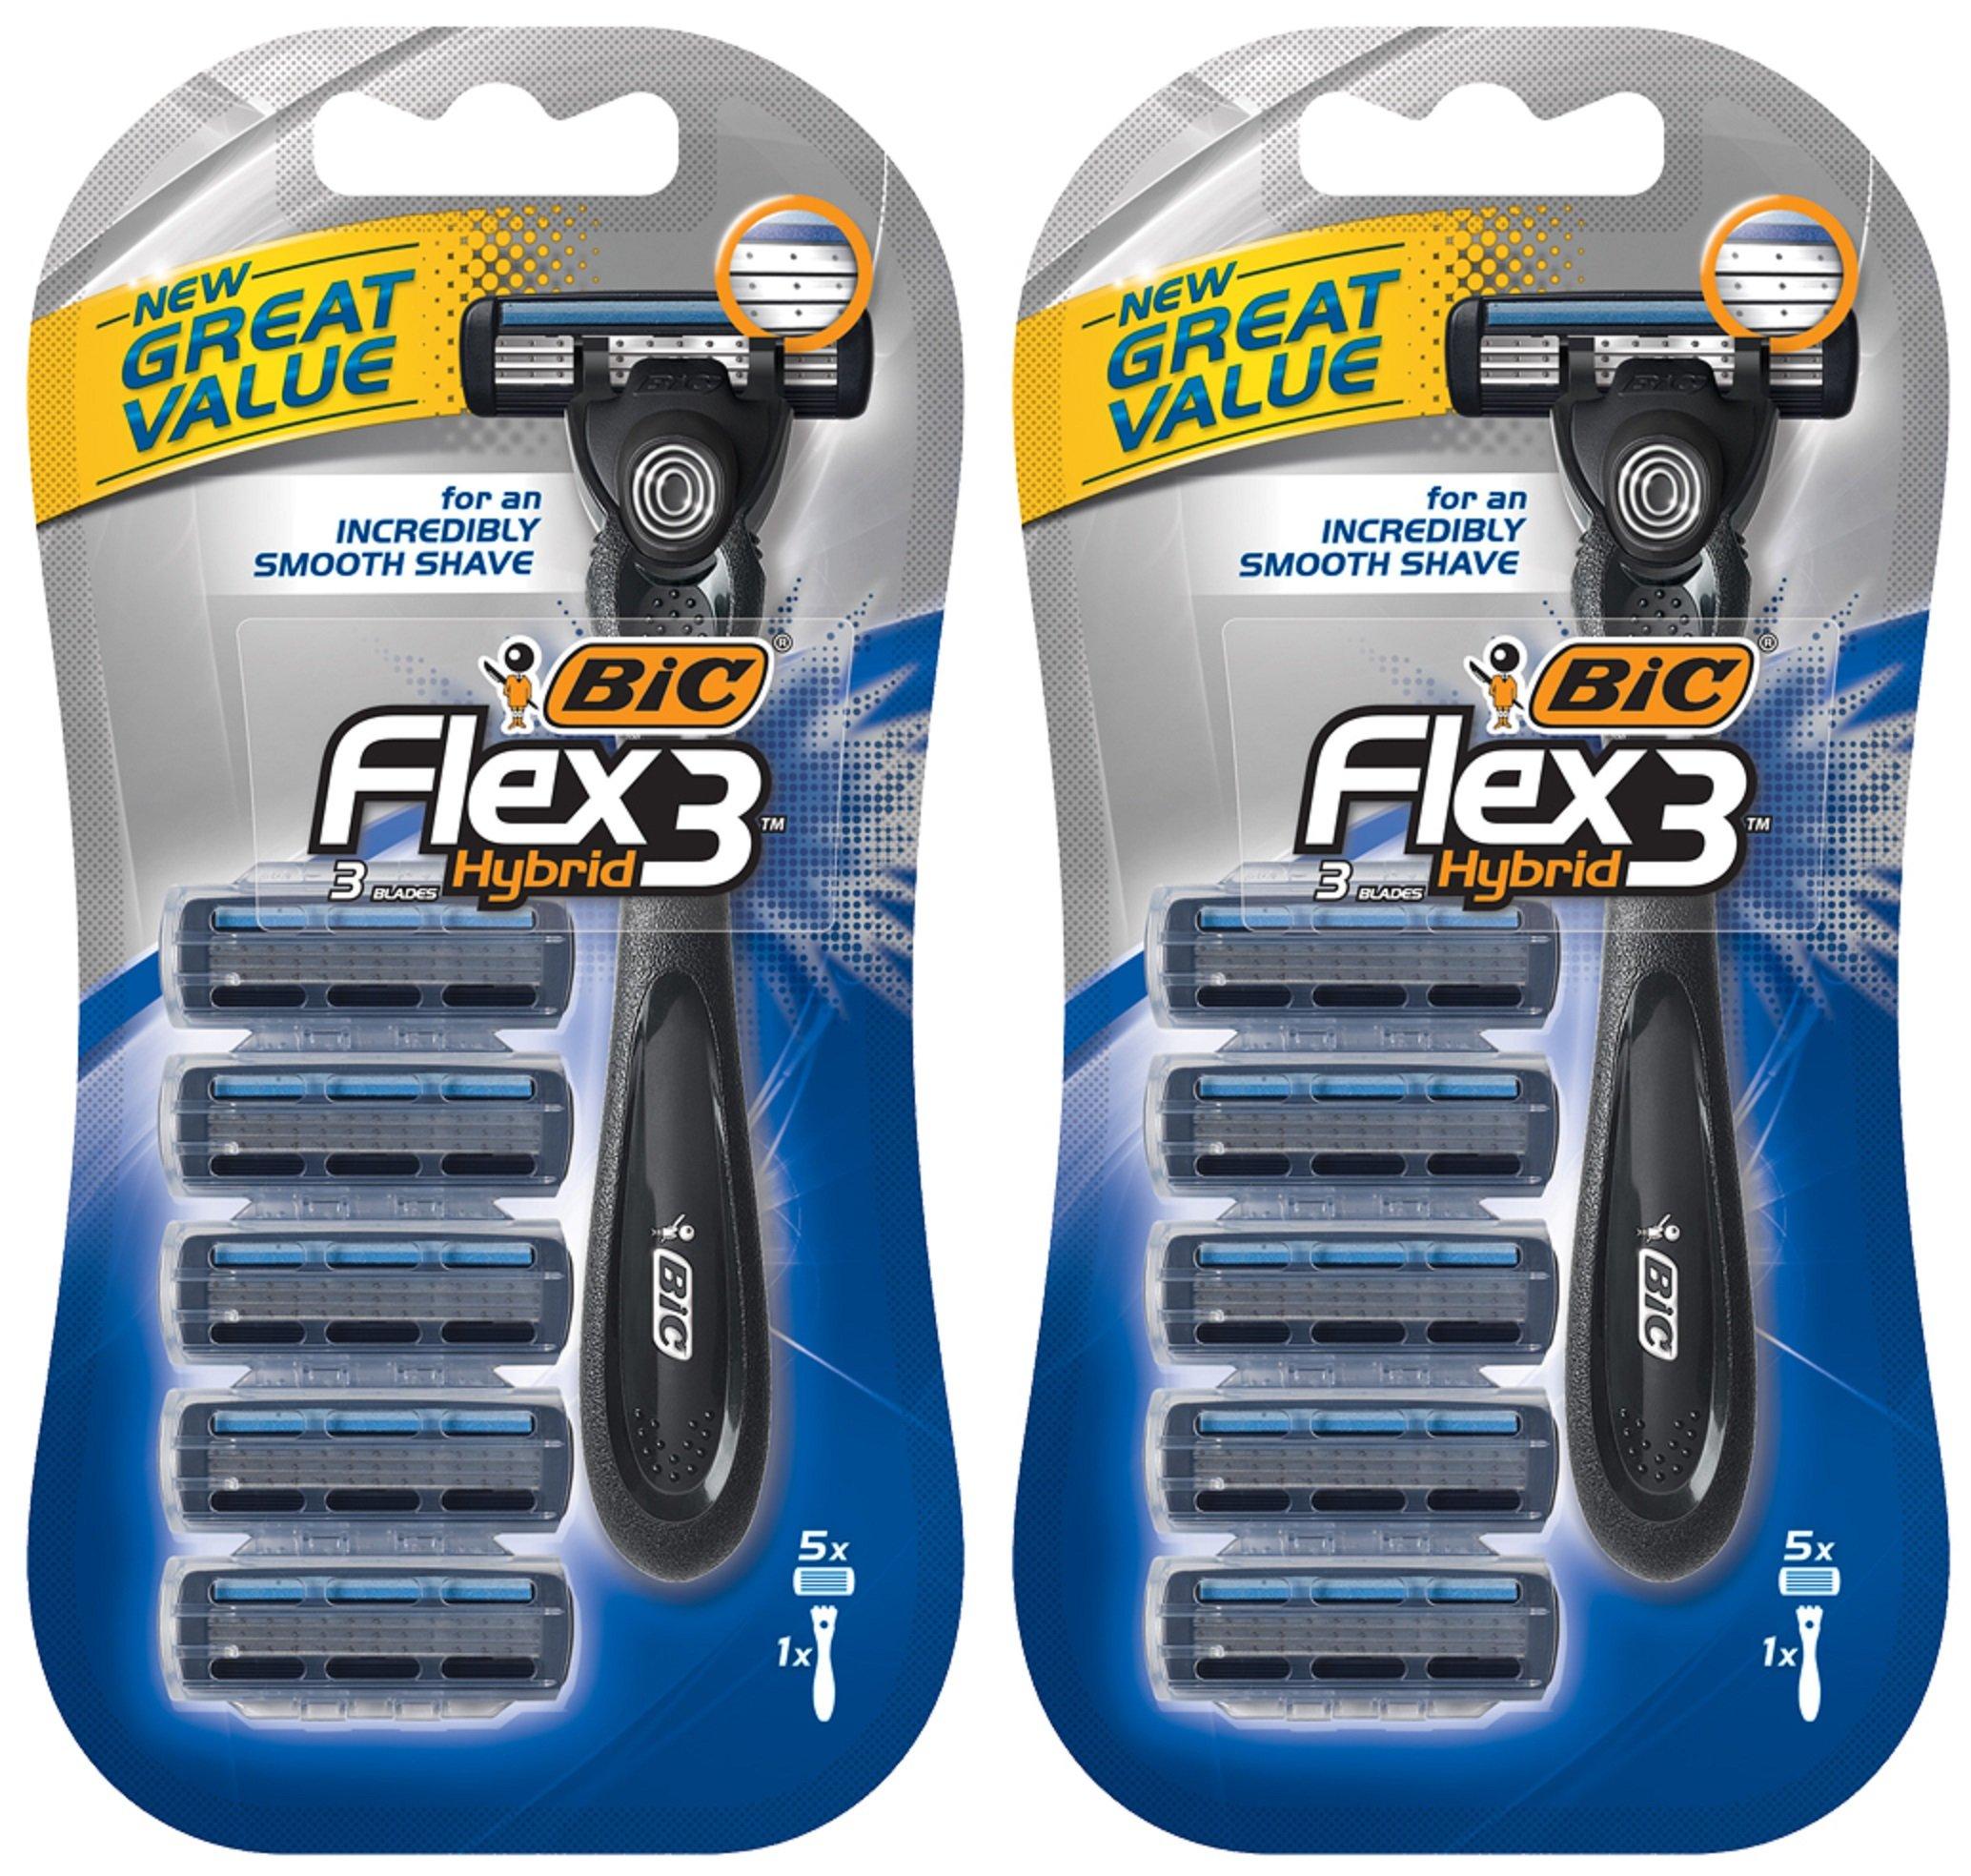 Bic Flex 3 Hybrid Razor For Men - 5 Cartridges & 1 Handle Per Package - Pack of 2 Packages